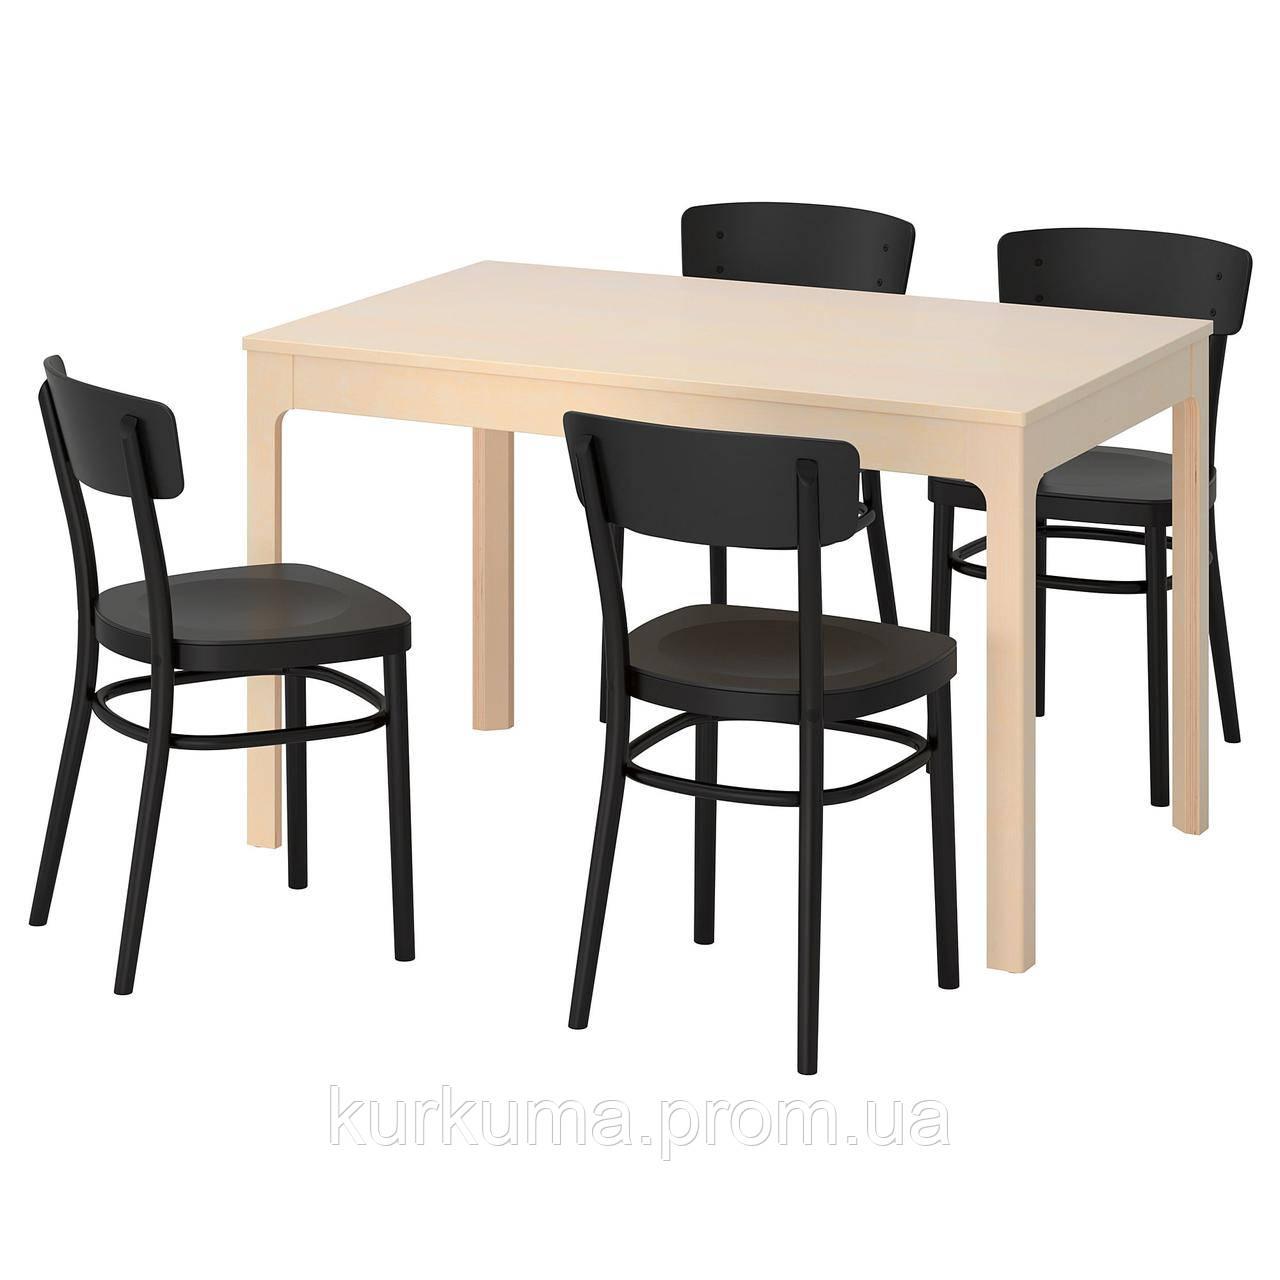 IKEA EKEDALEN/IDOLF Стол и 4 стула, береза, черная  (092.214.60)